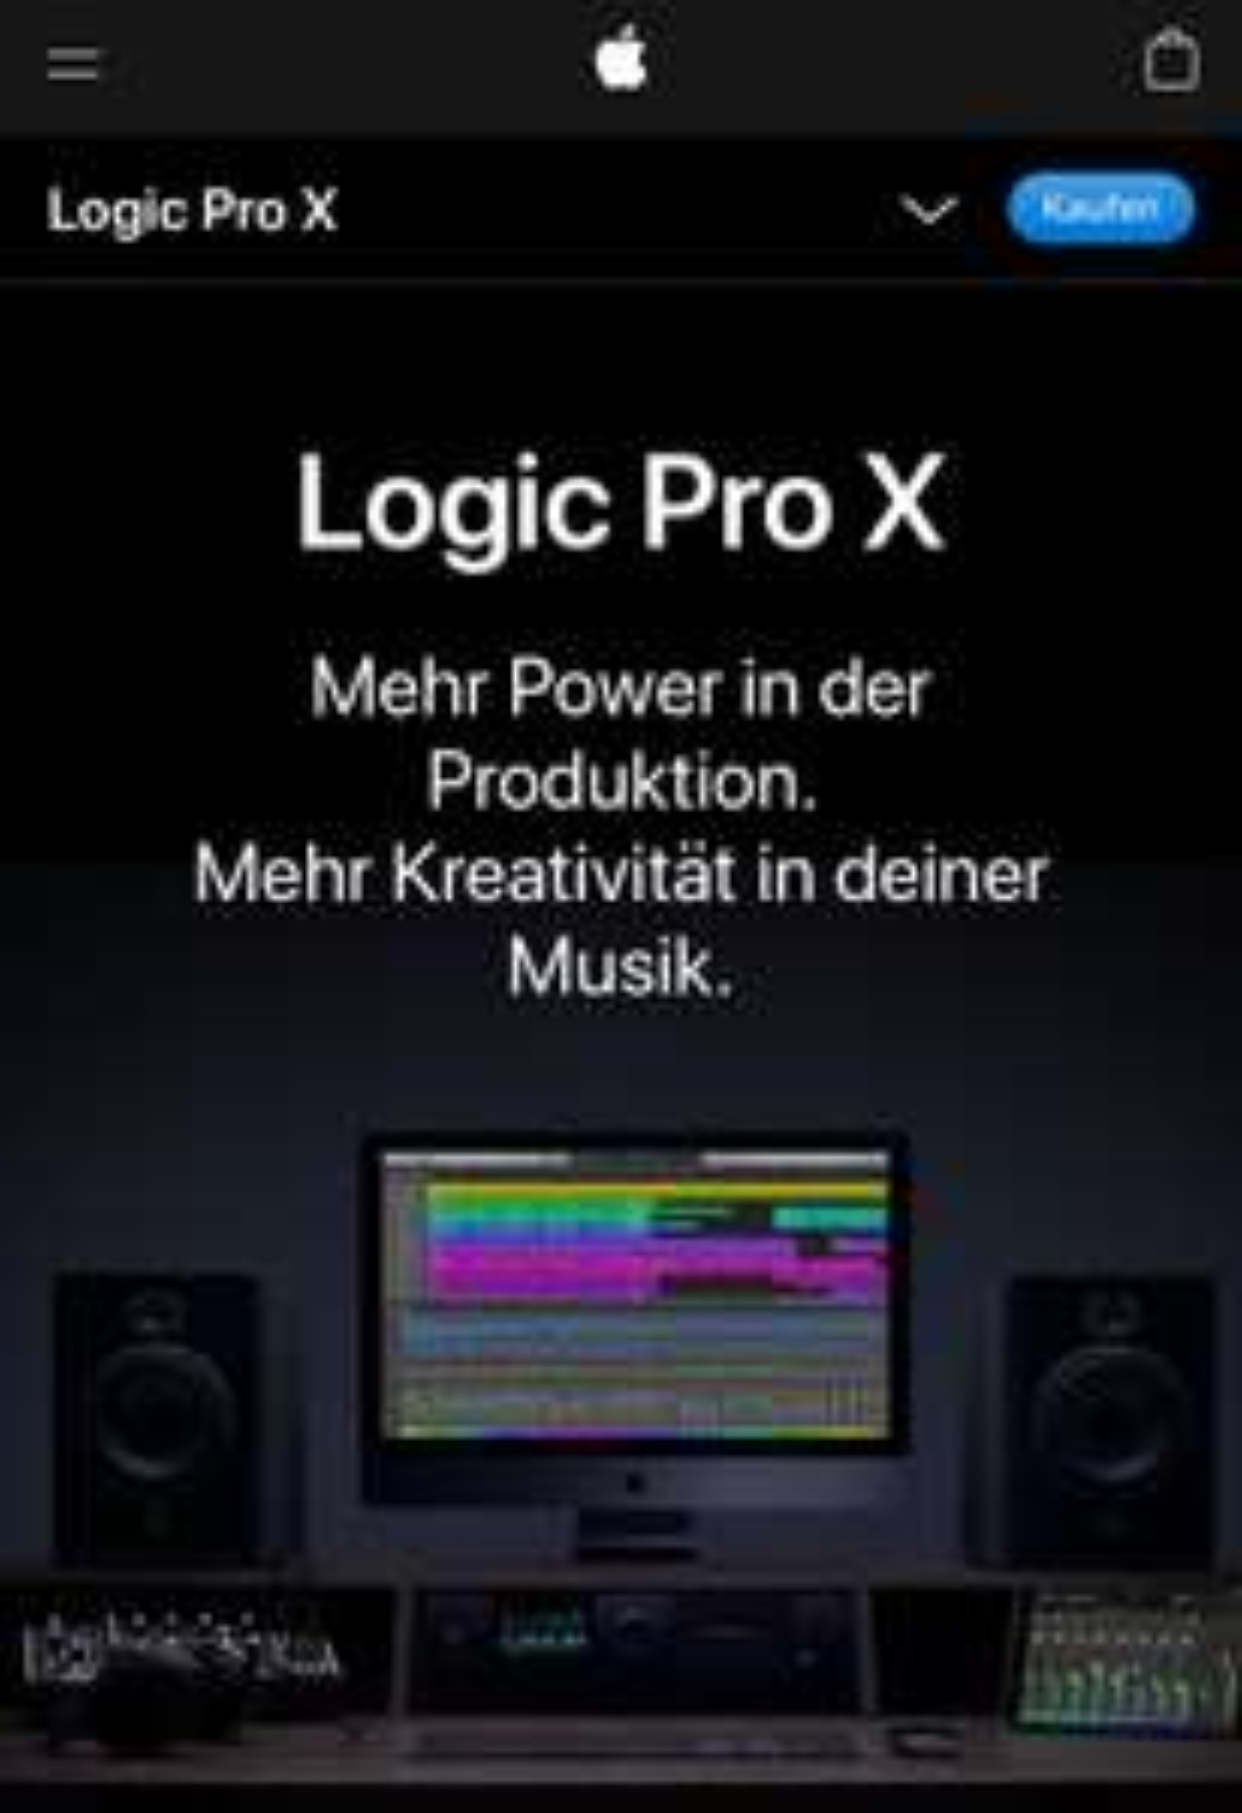 Apple Logic Pro X durch iTunes / AppStore Deal bei Lidl